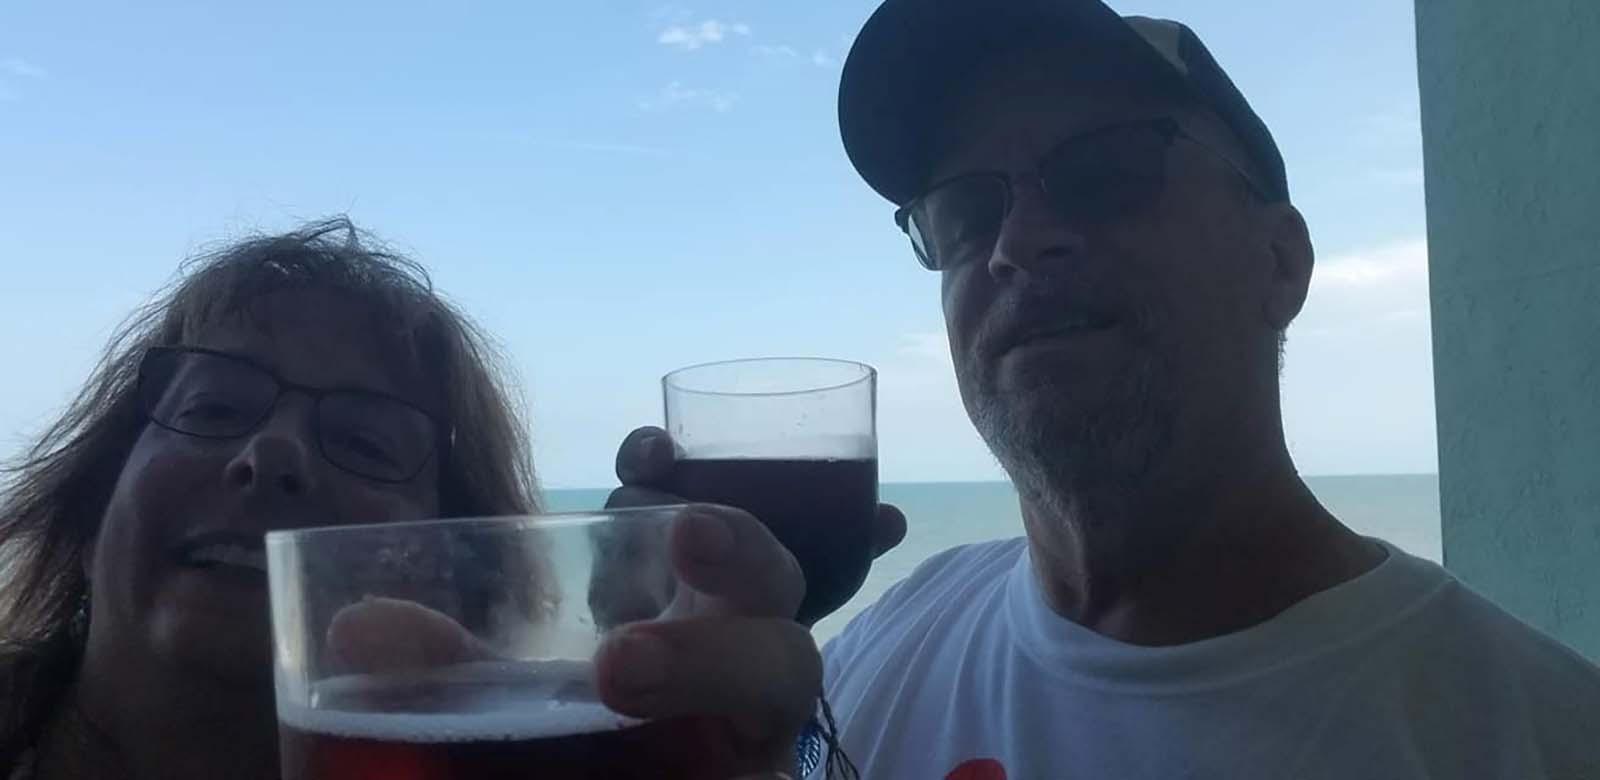 couple drinking on balcony